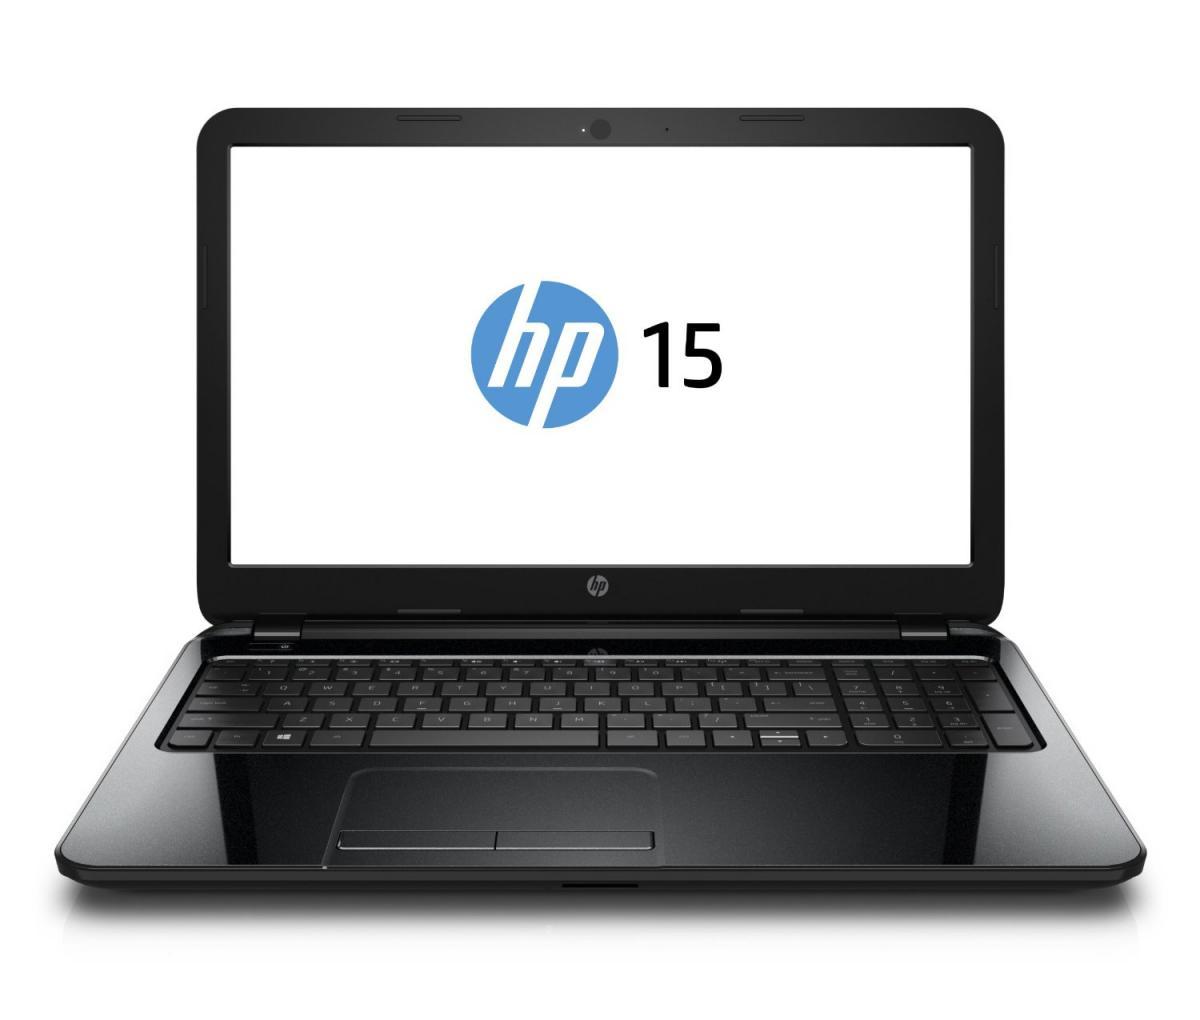 HP 15-g070nr 15.6-Inch Laptop